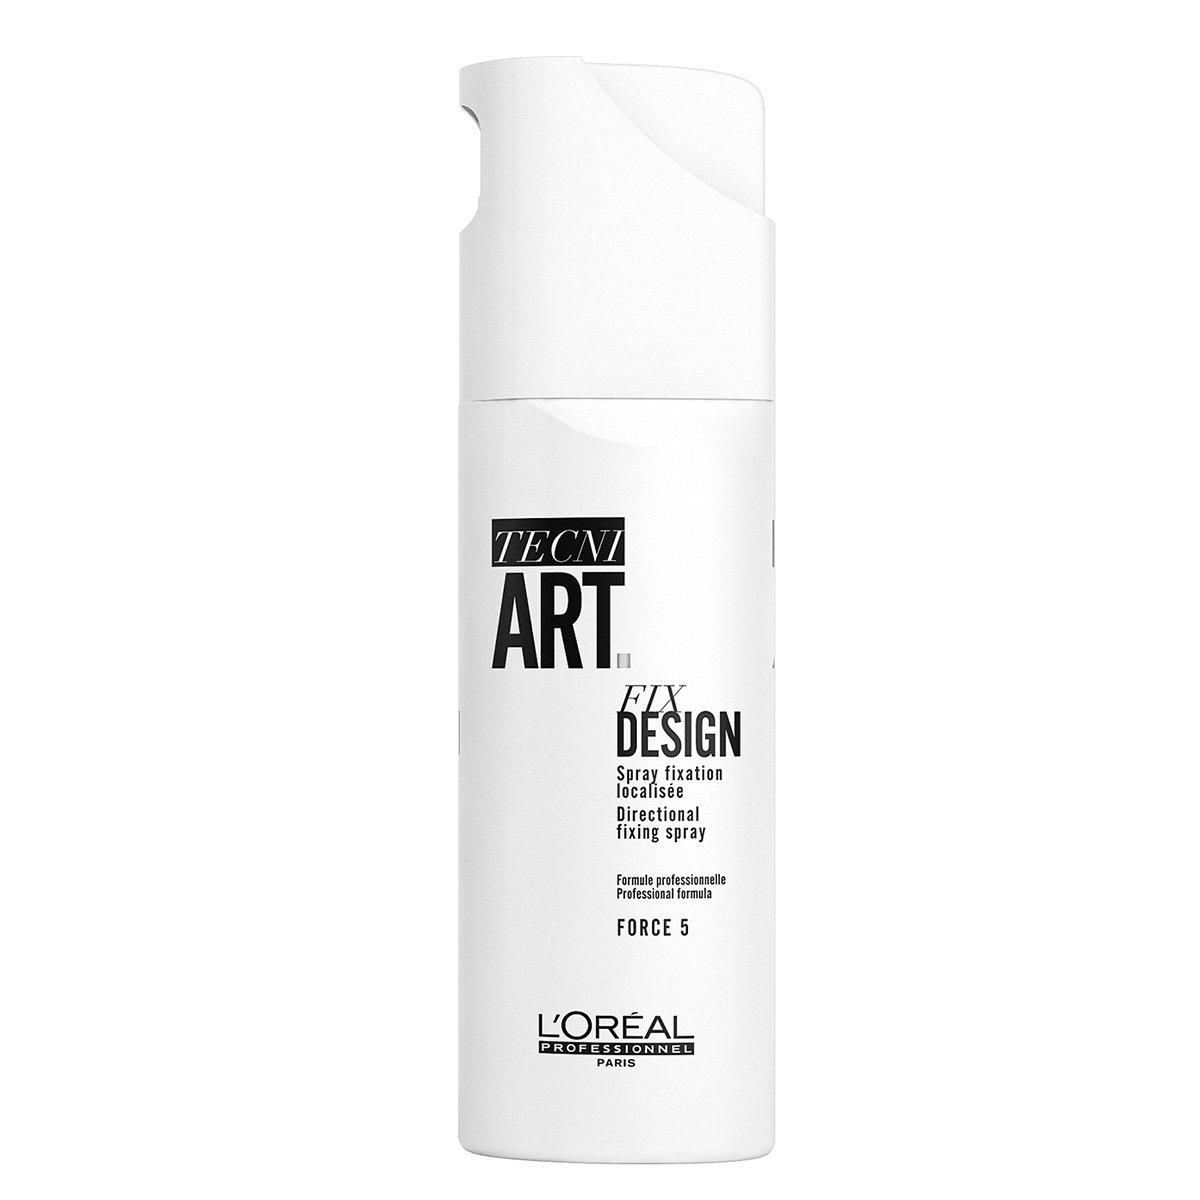 Spray de Fixação Localizada L'Oréal Professionnel Tecni.Art Fix Design Force 5 200ml